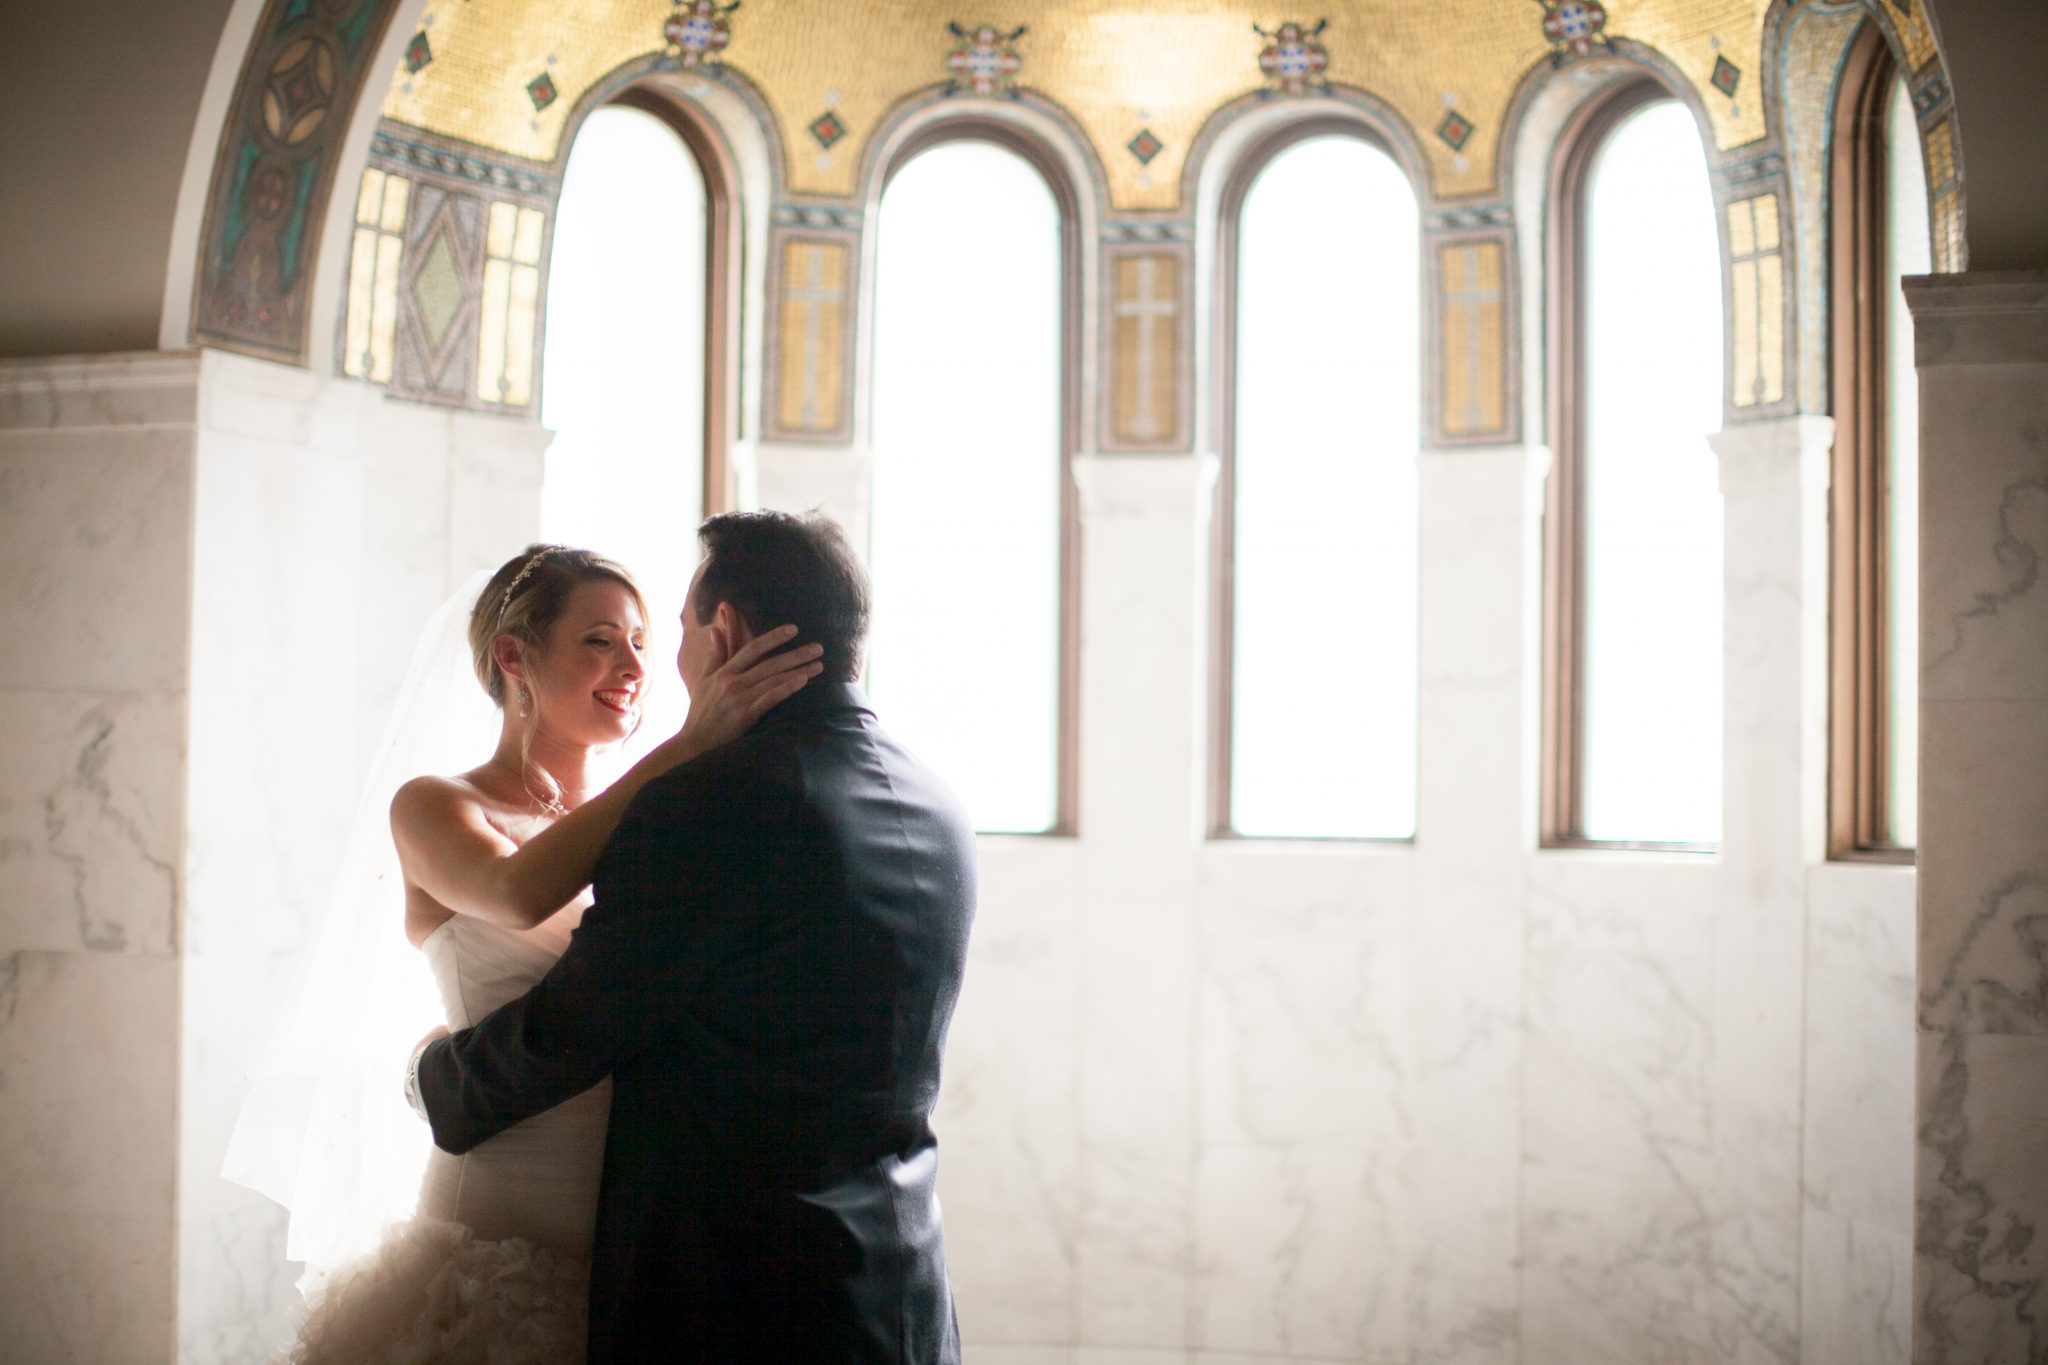 Kim & Mike Wedding at the Vibiana